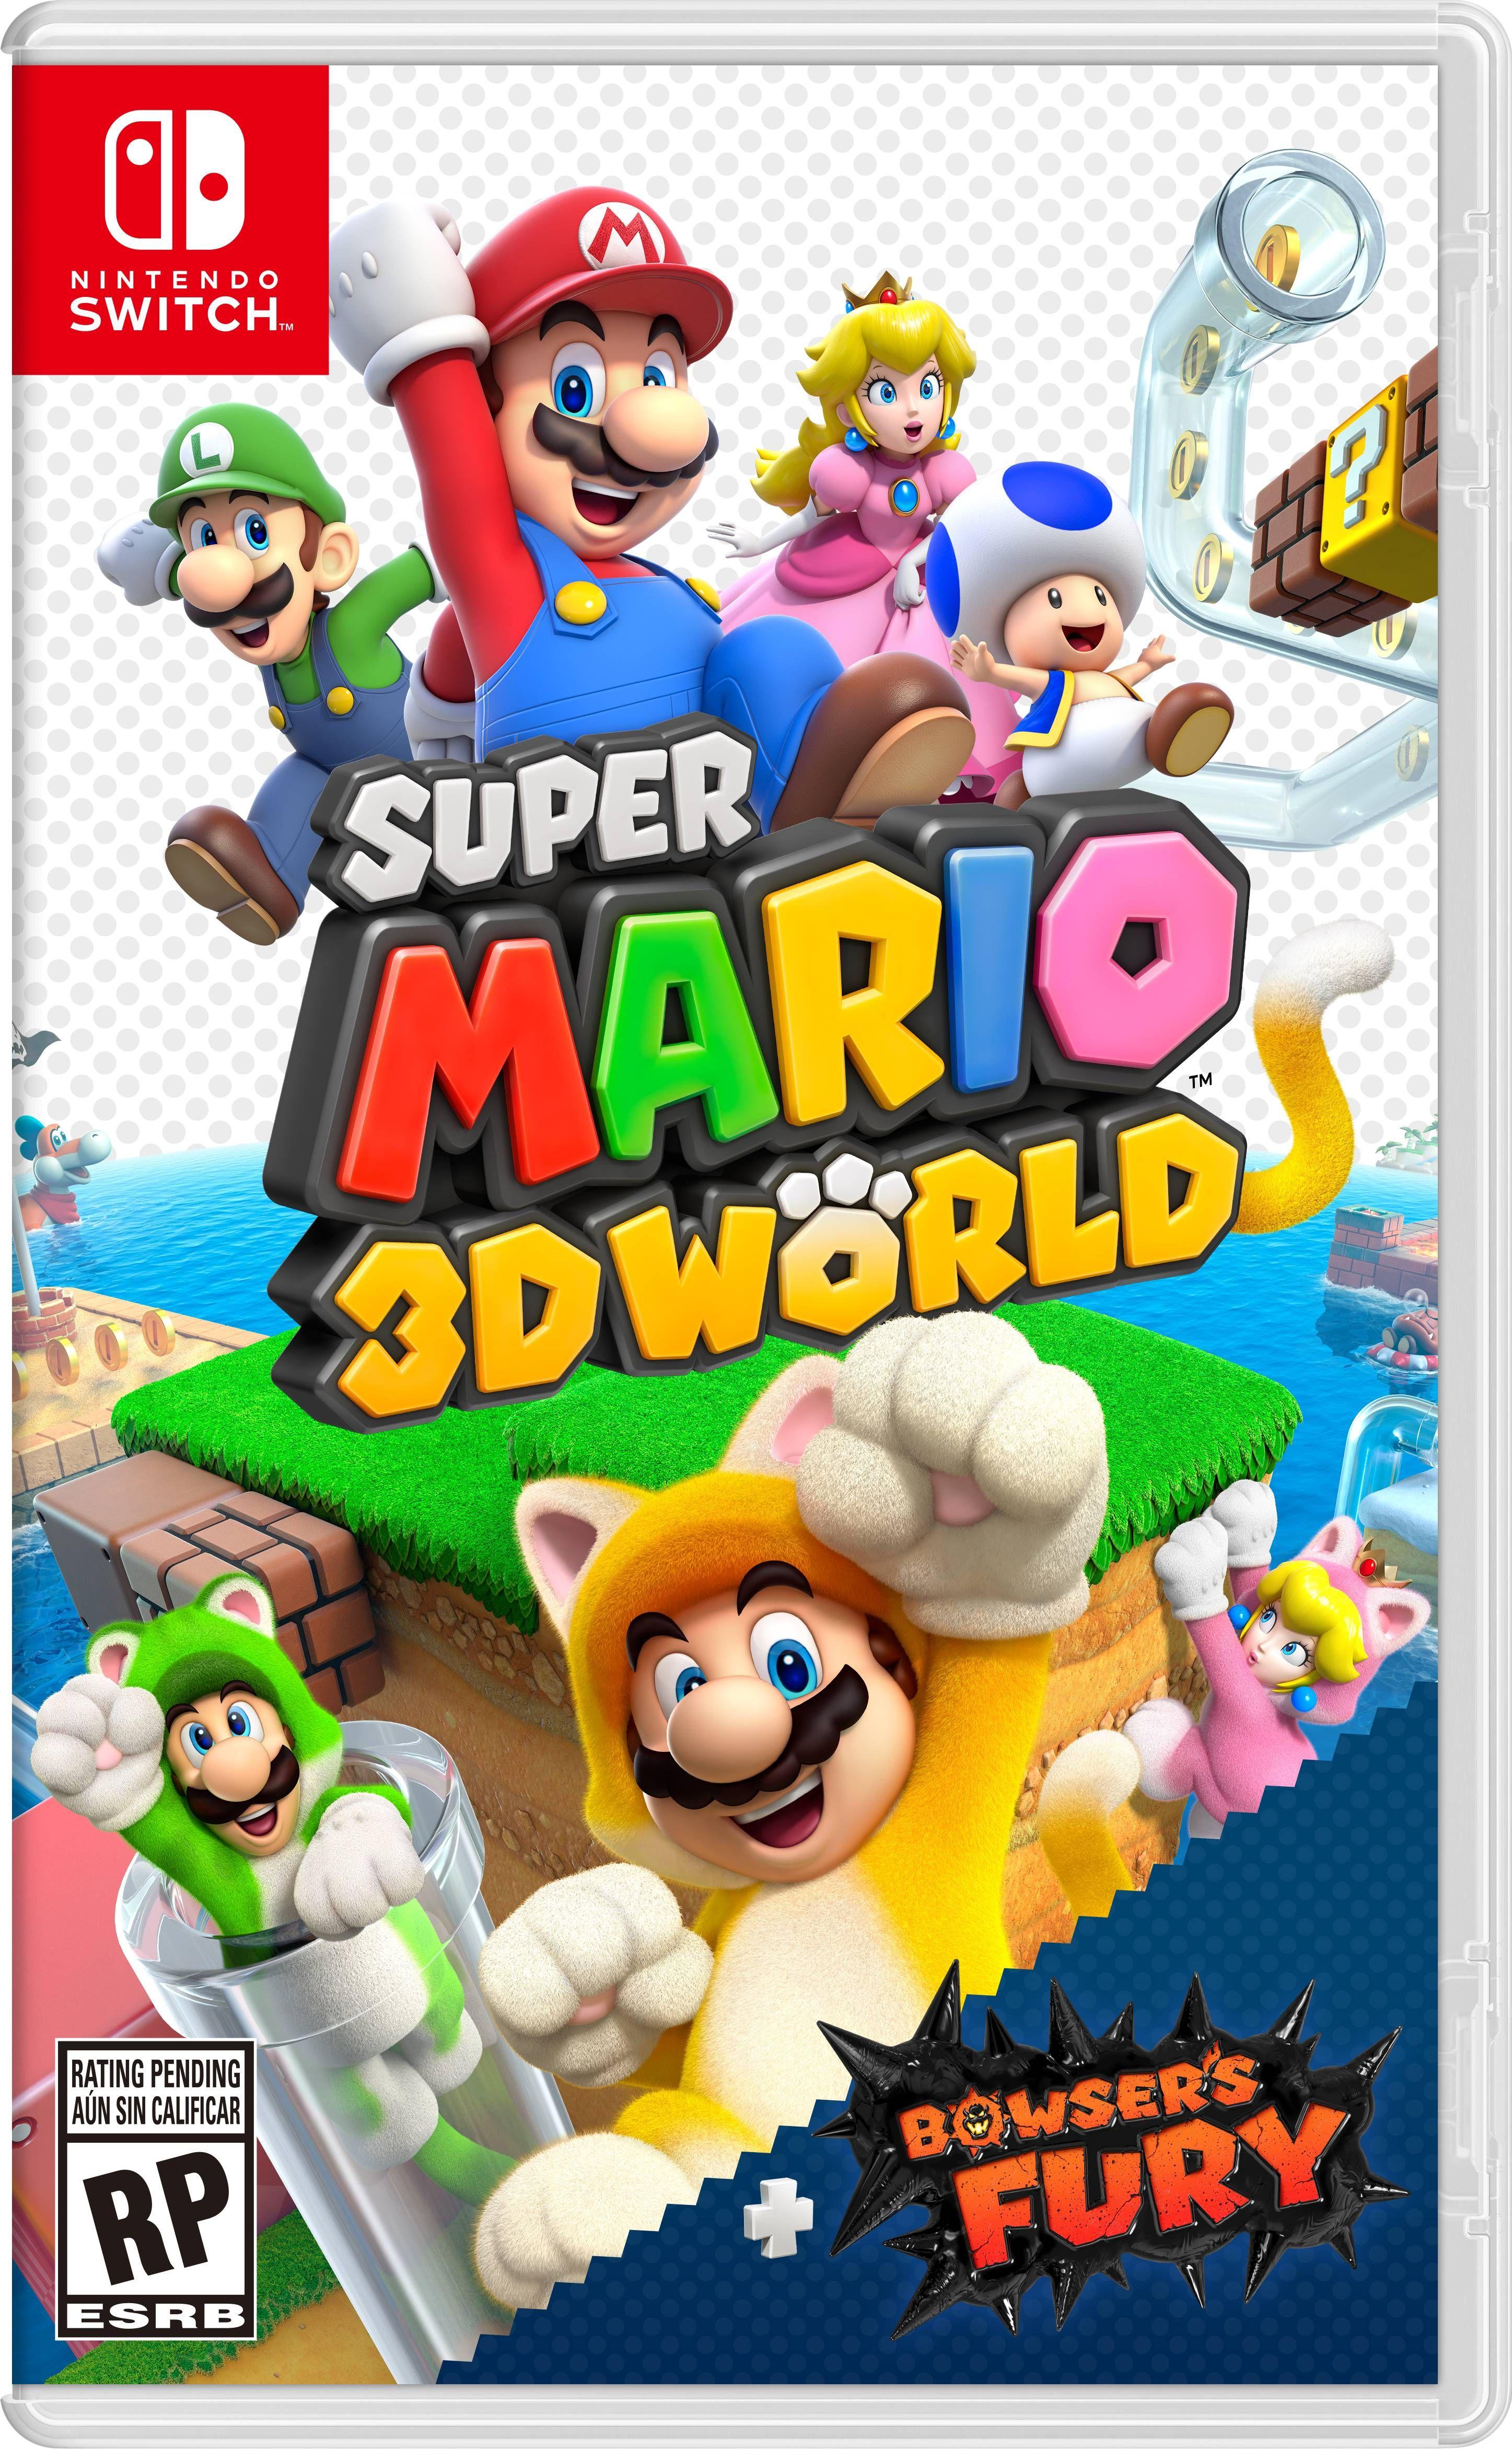 Super Mario 3d World Bowser S Fury Nintendo Nintendo Switch 00045496594022 Walmart Com In 2021 Super Mario 3d Nintendo Switch Games Nintendo Switch Super Mario